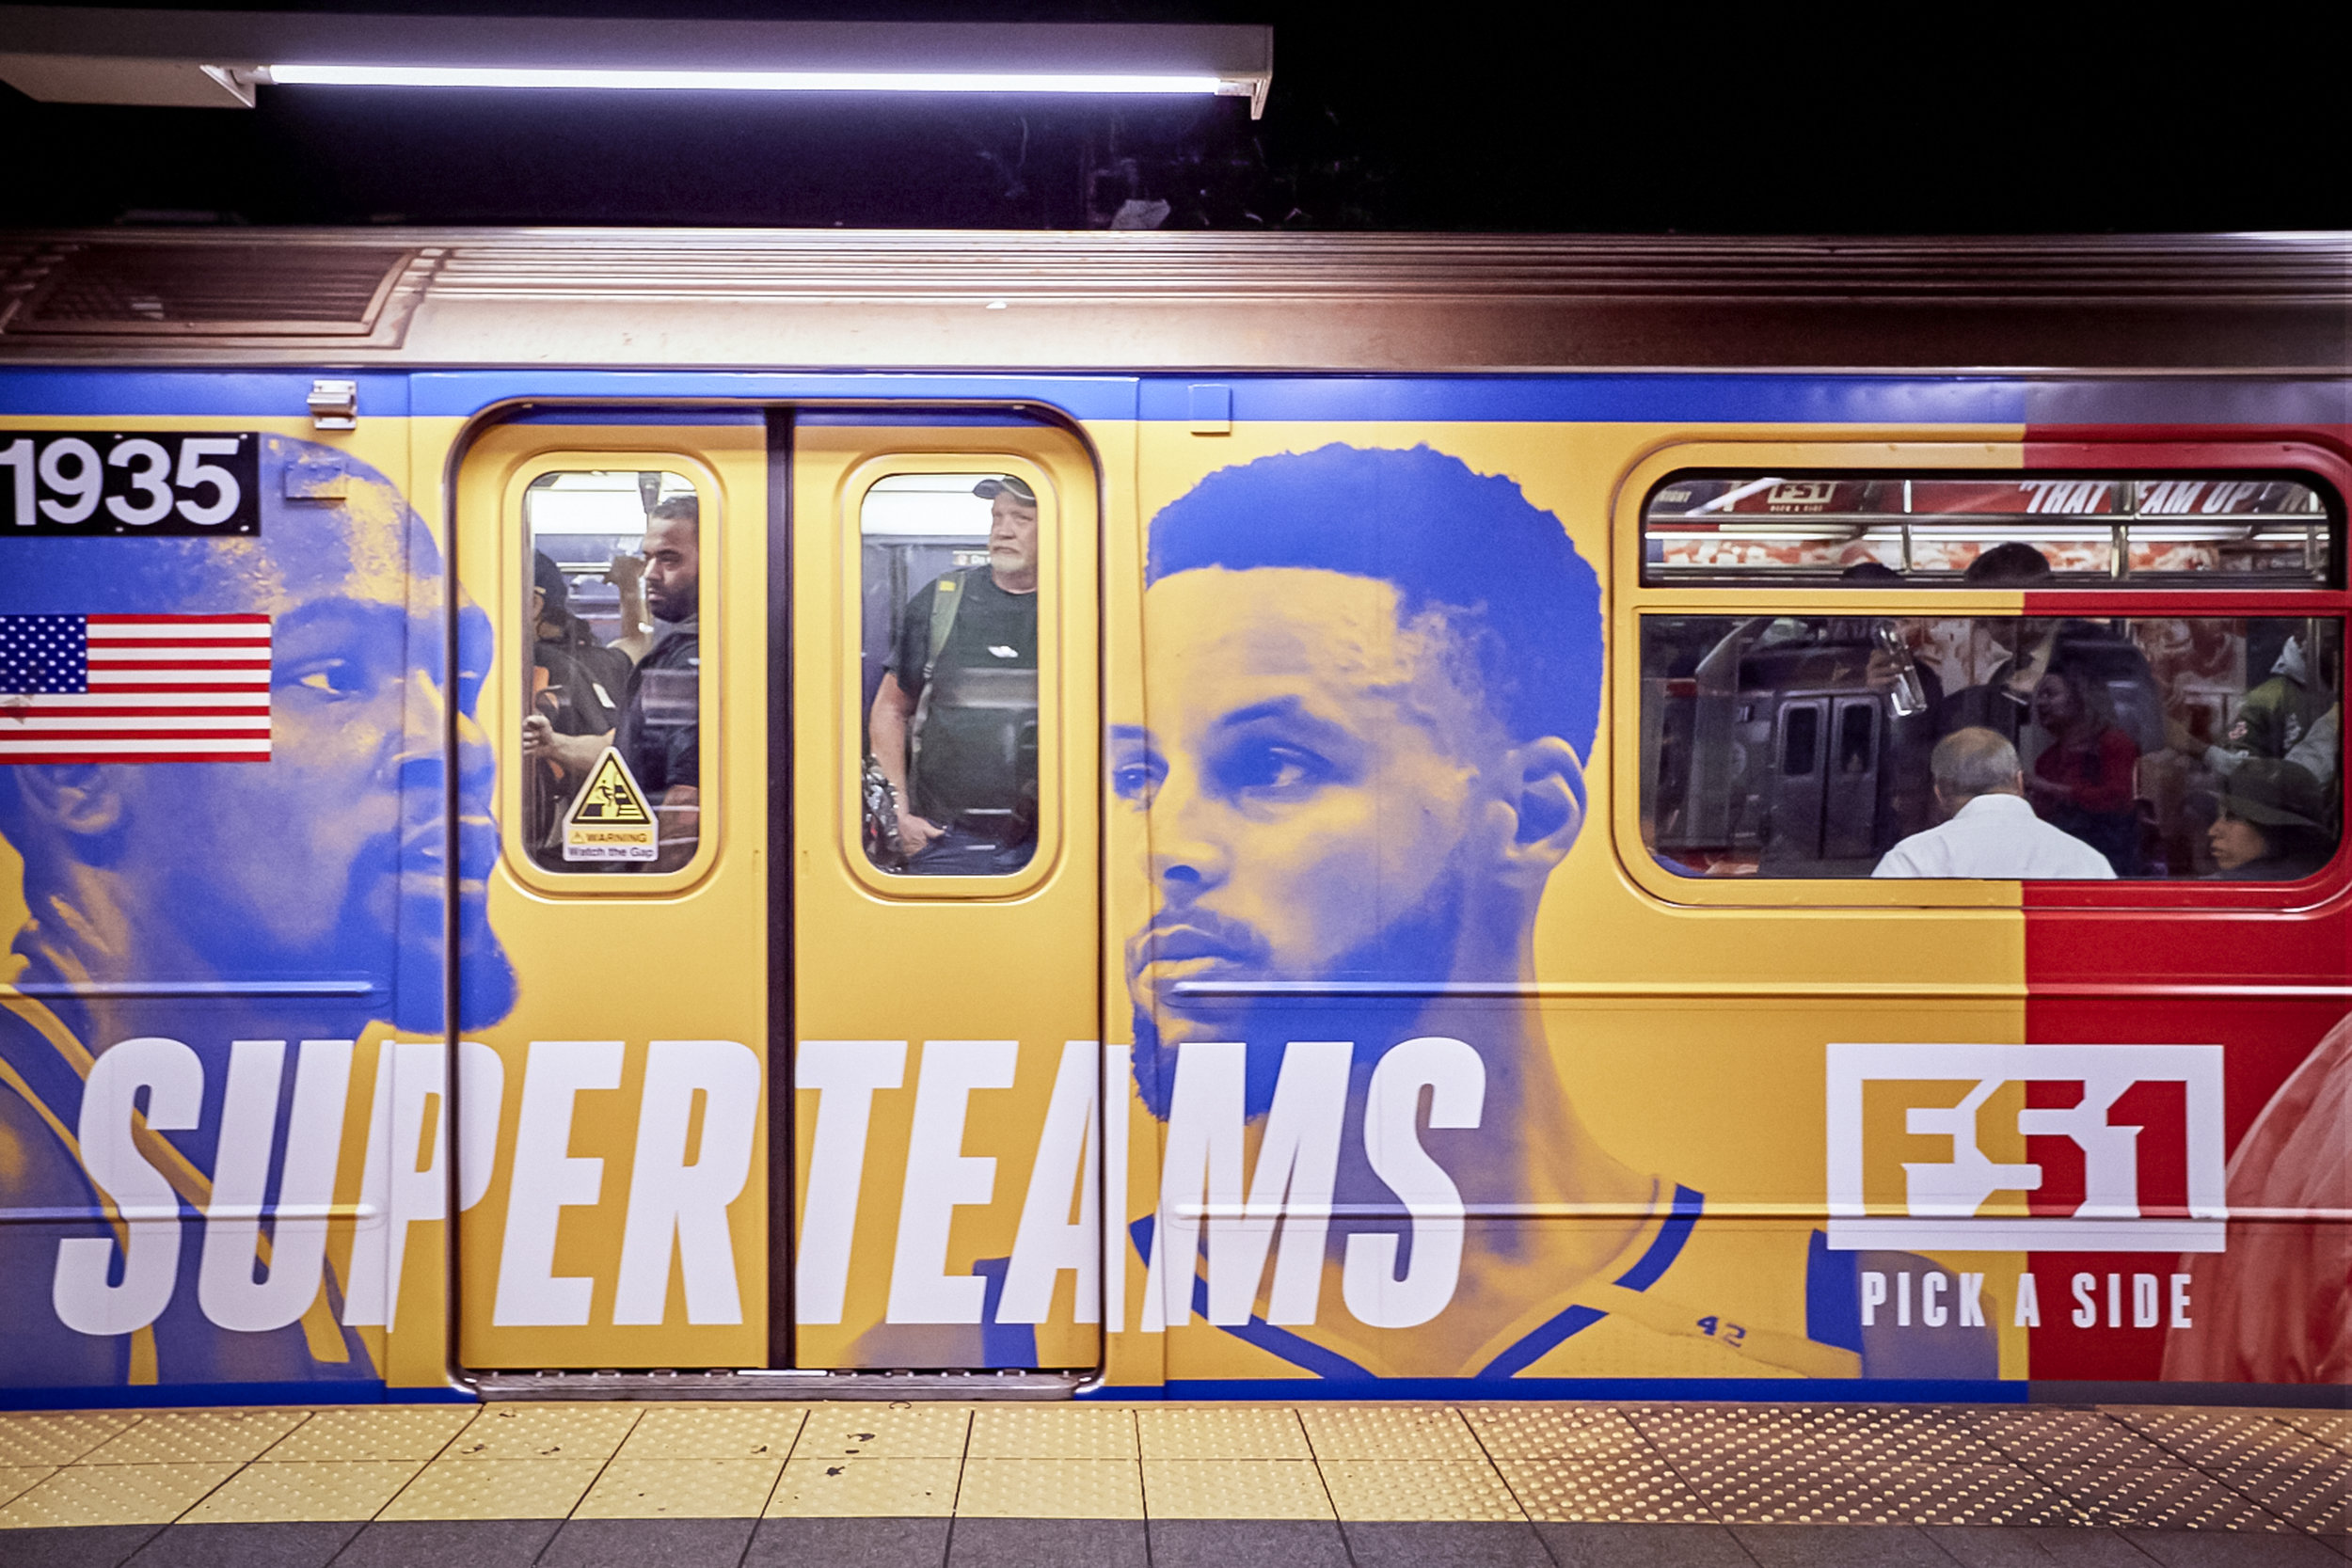 FS1_subway_shots_10c.jpg